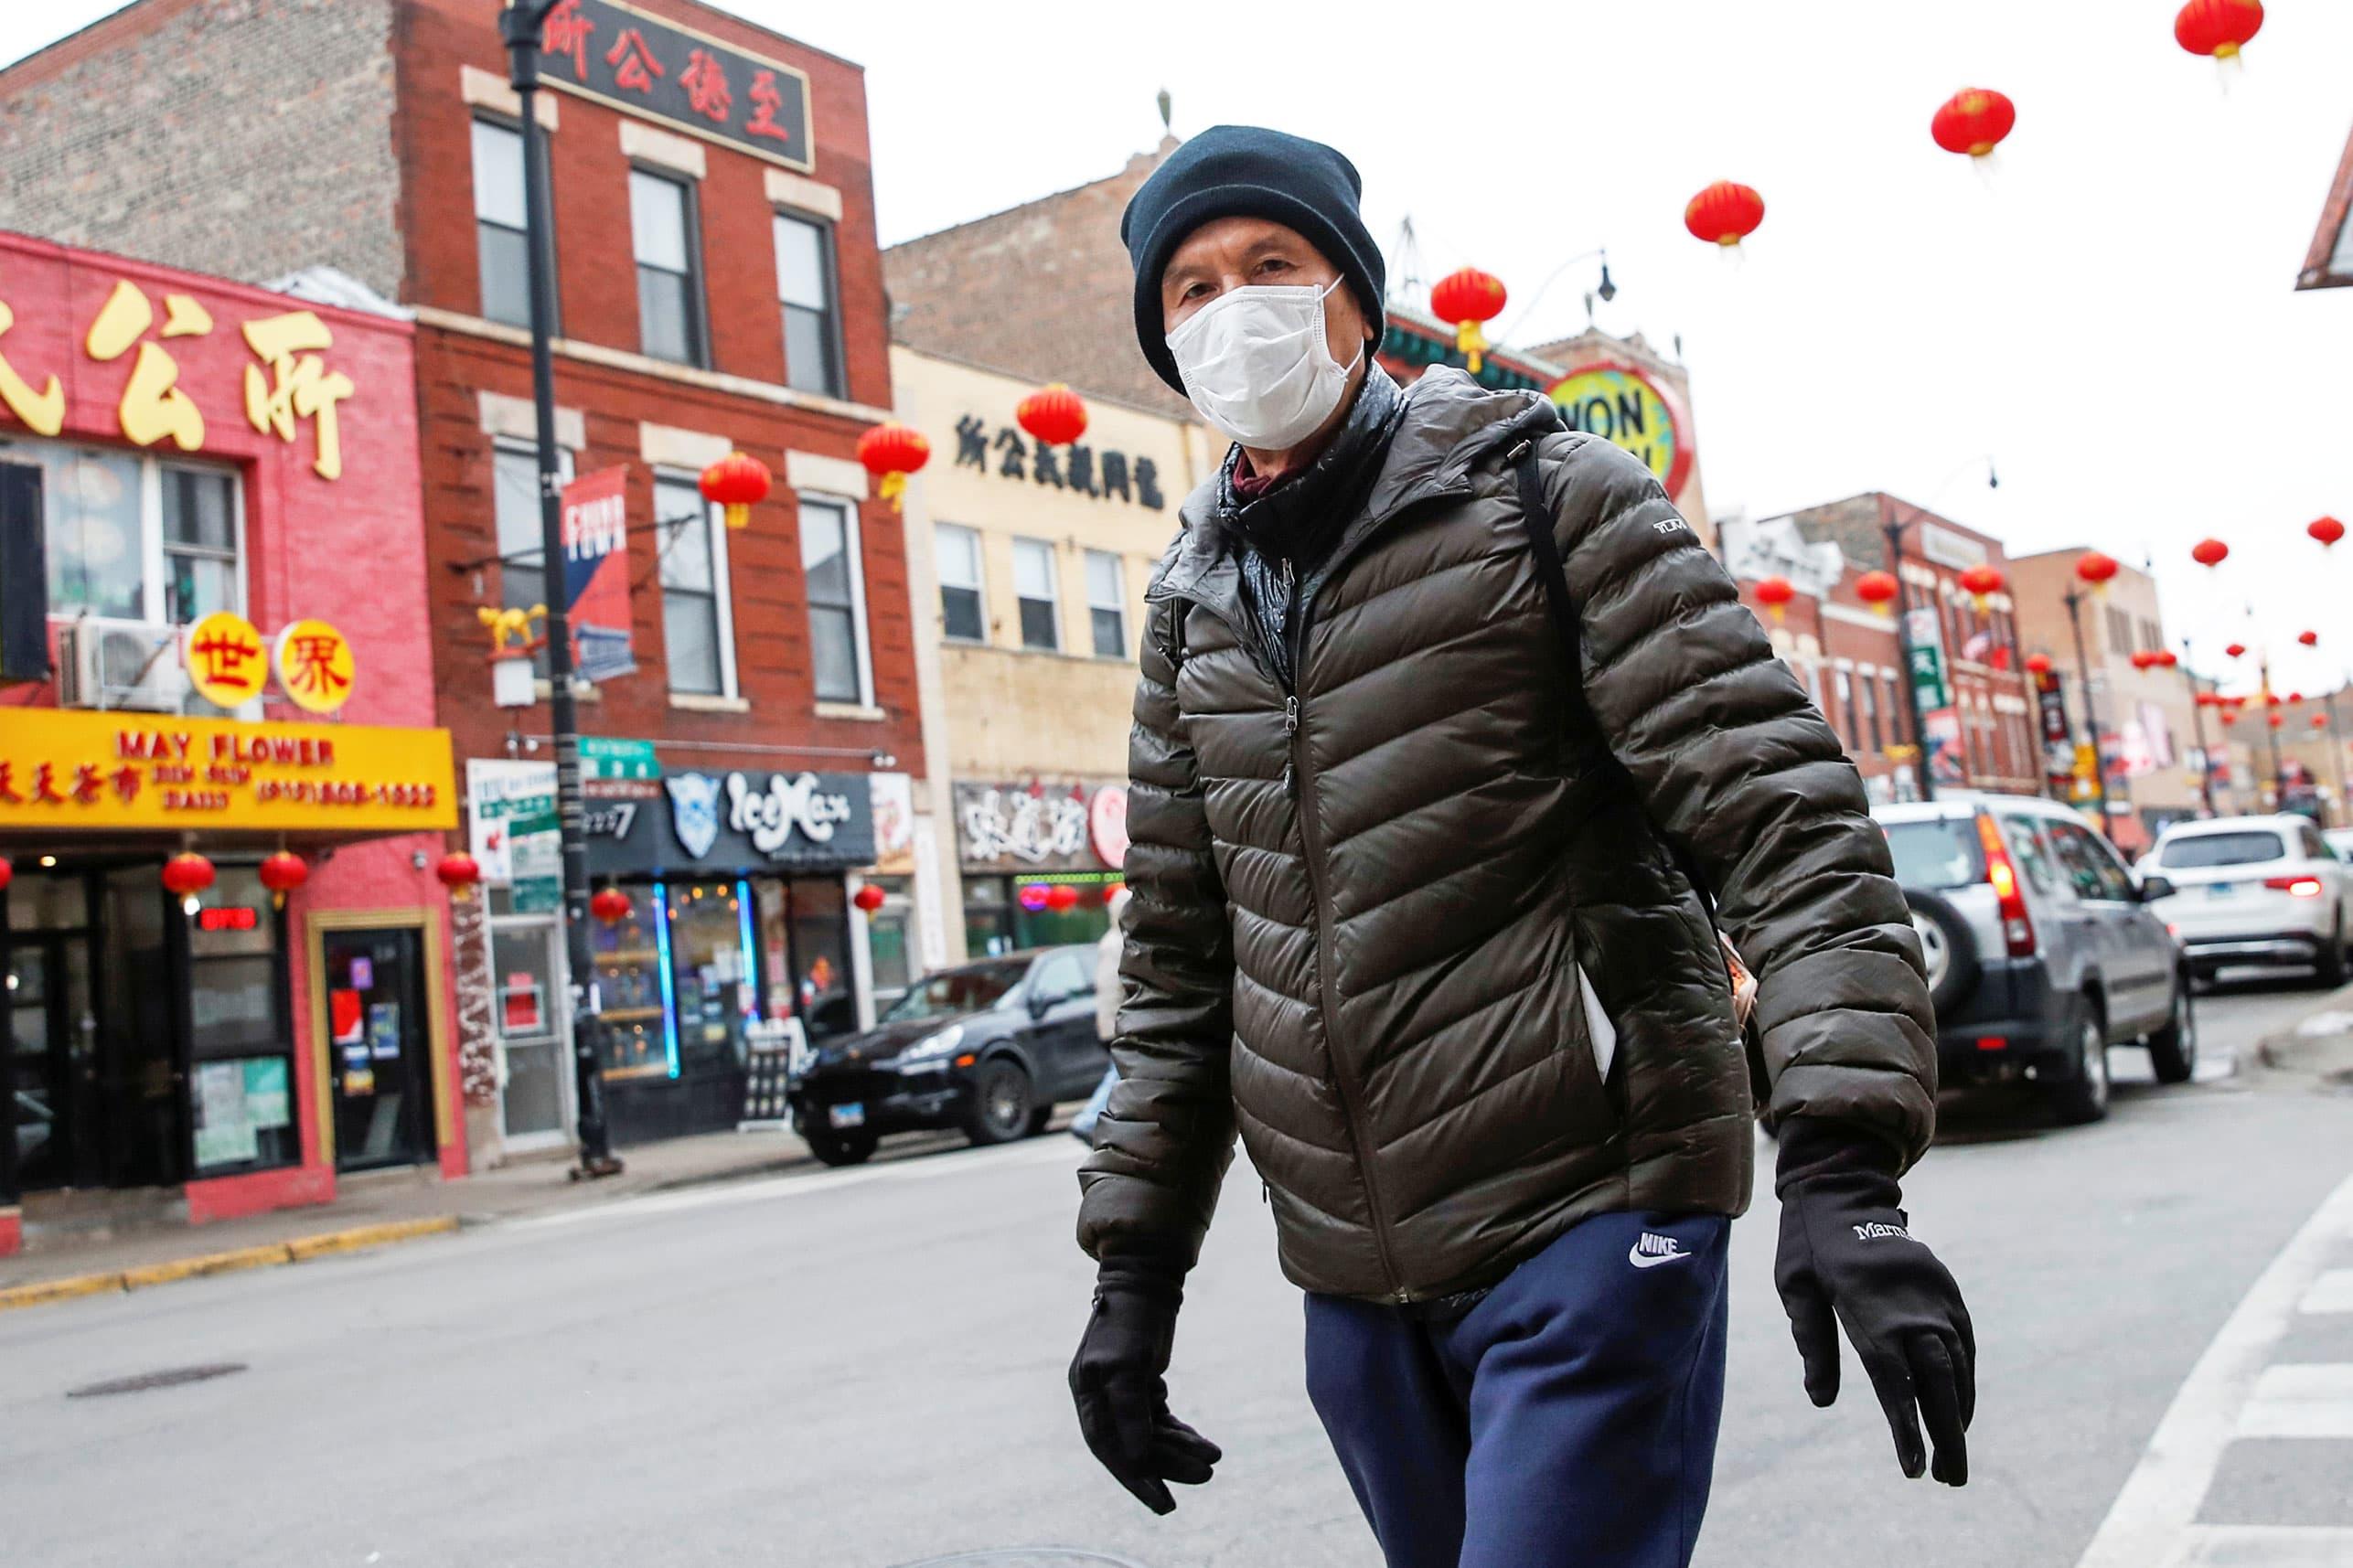 Coronavirus 'very contagious' but we'll get past epidemic: AstraZeneca